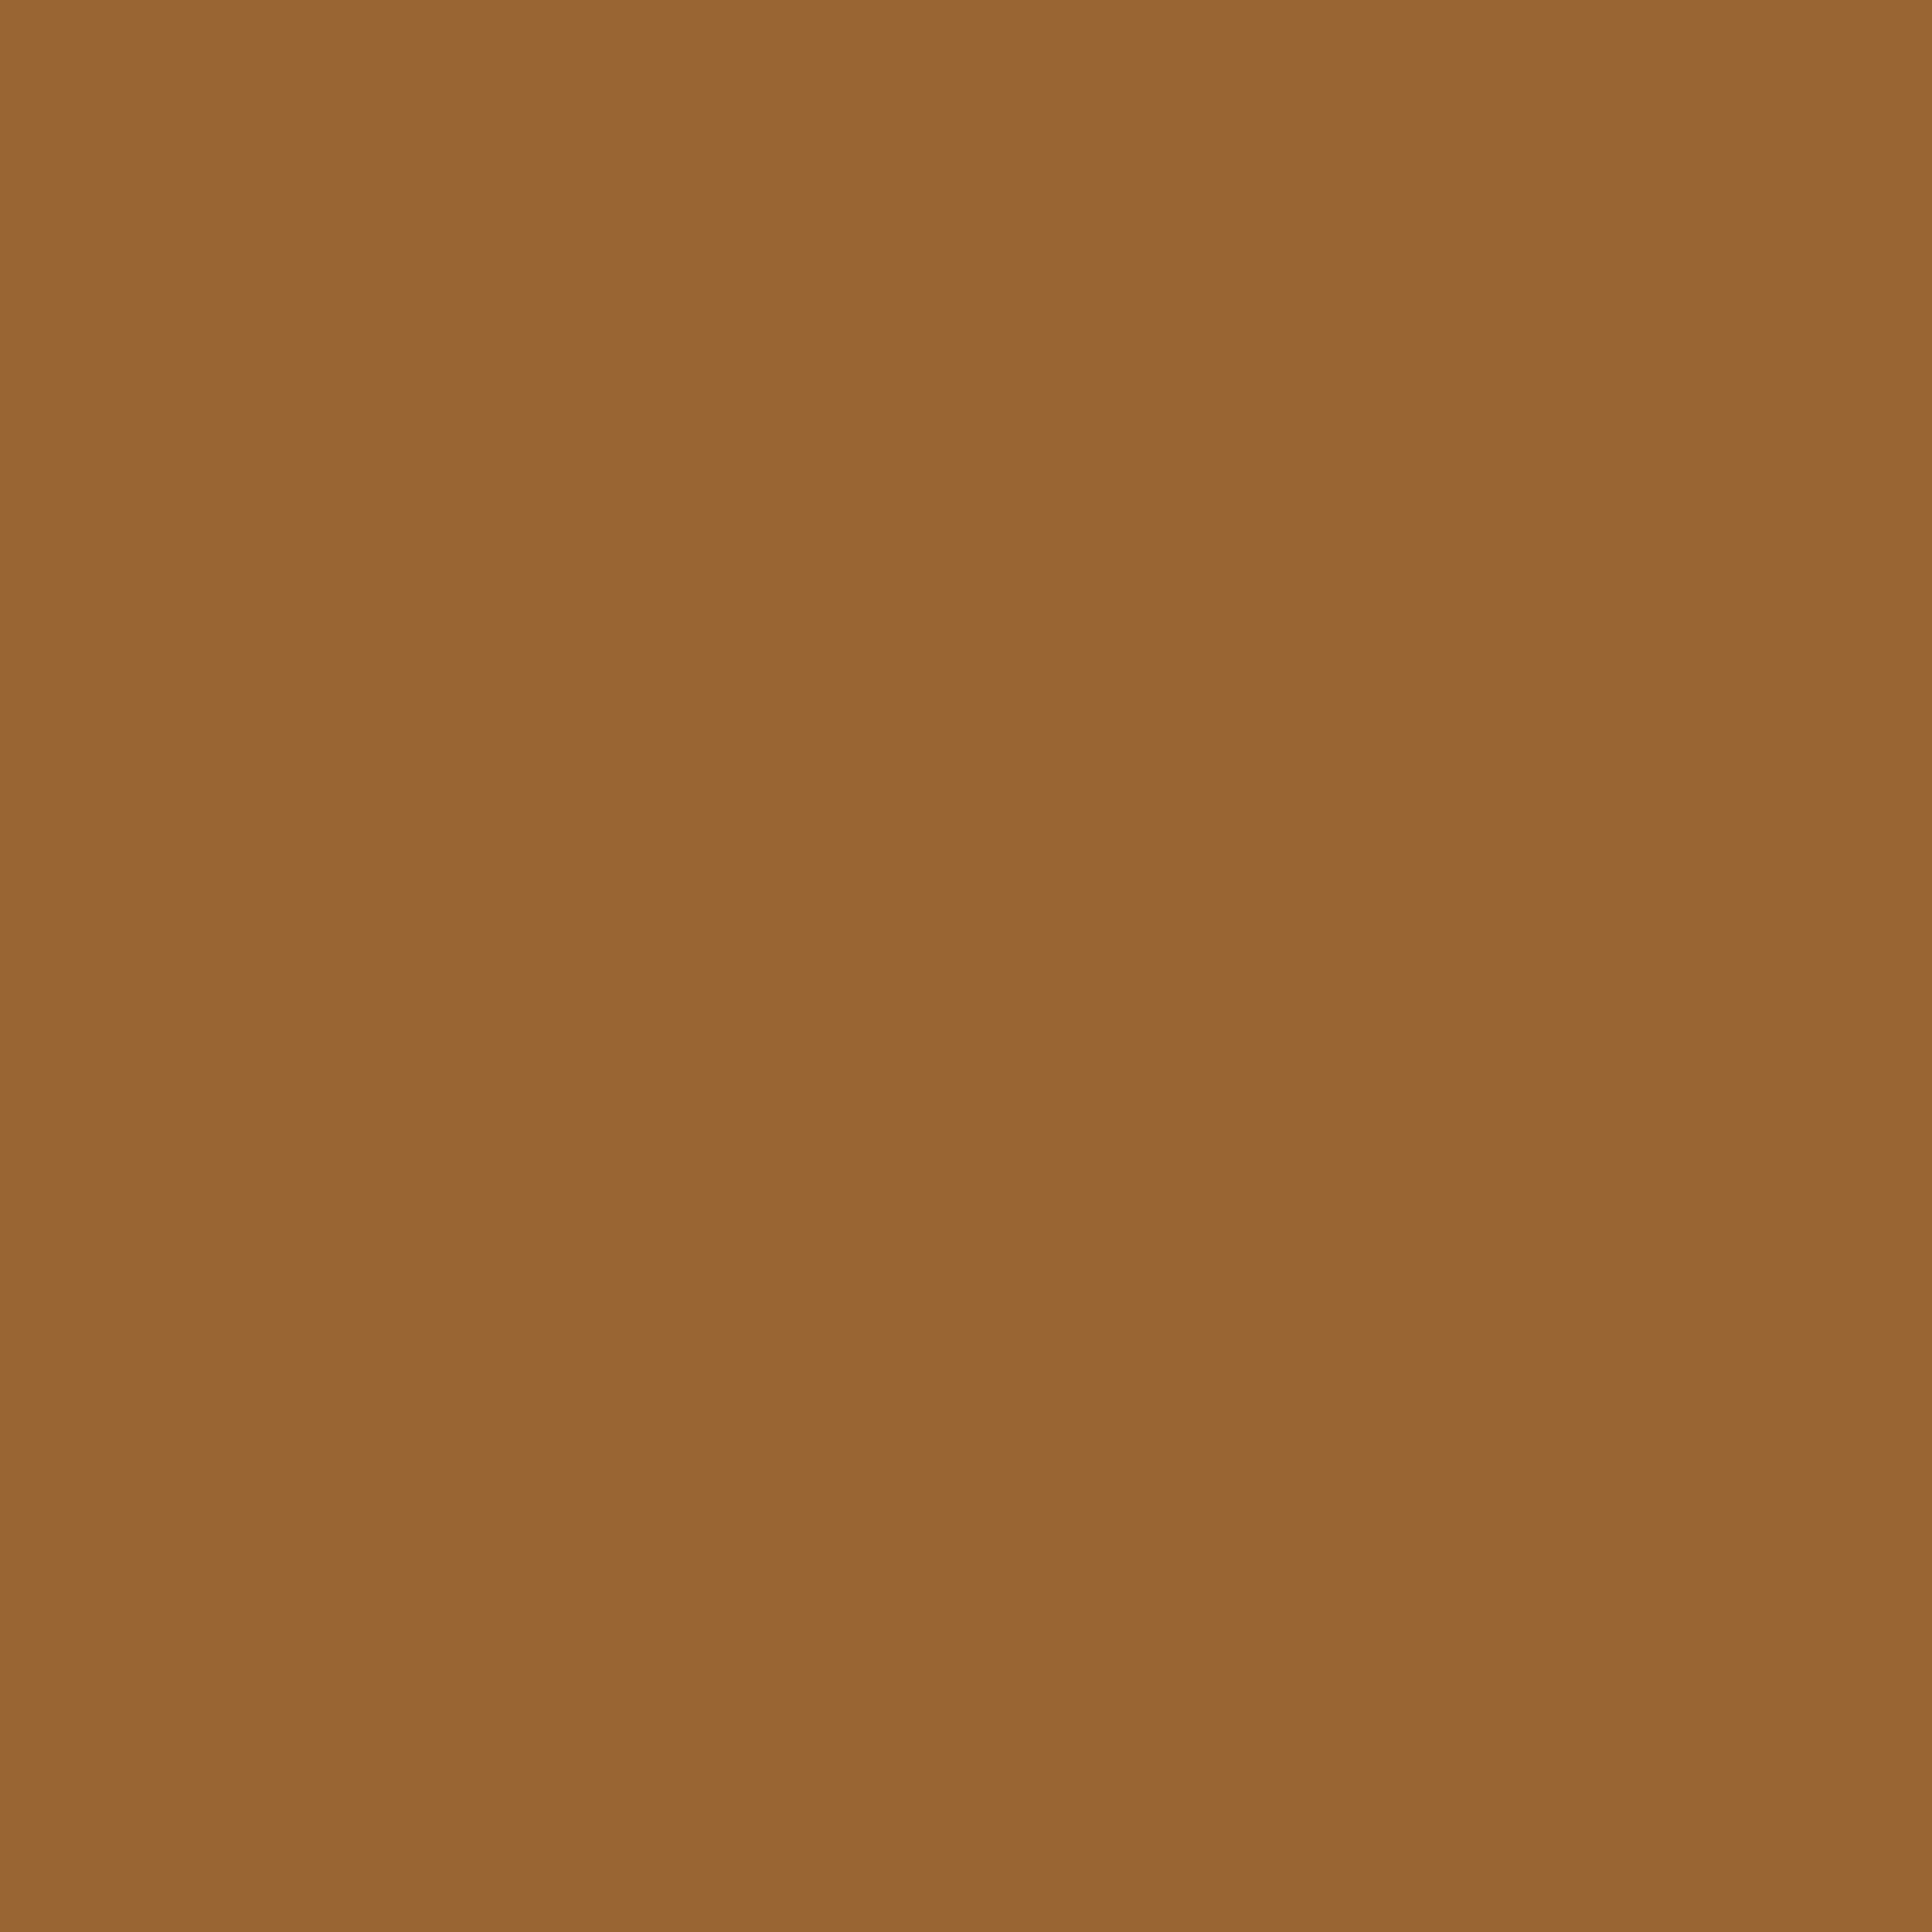 Chestnut-timber brown